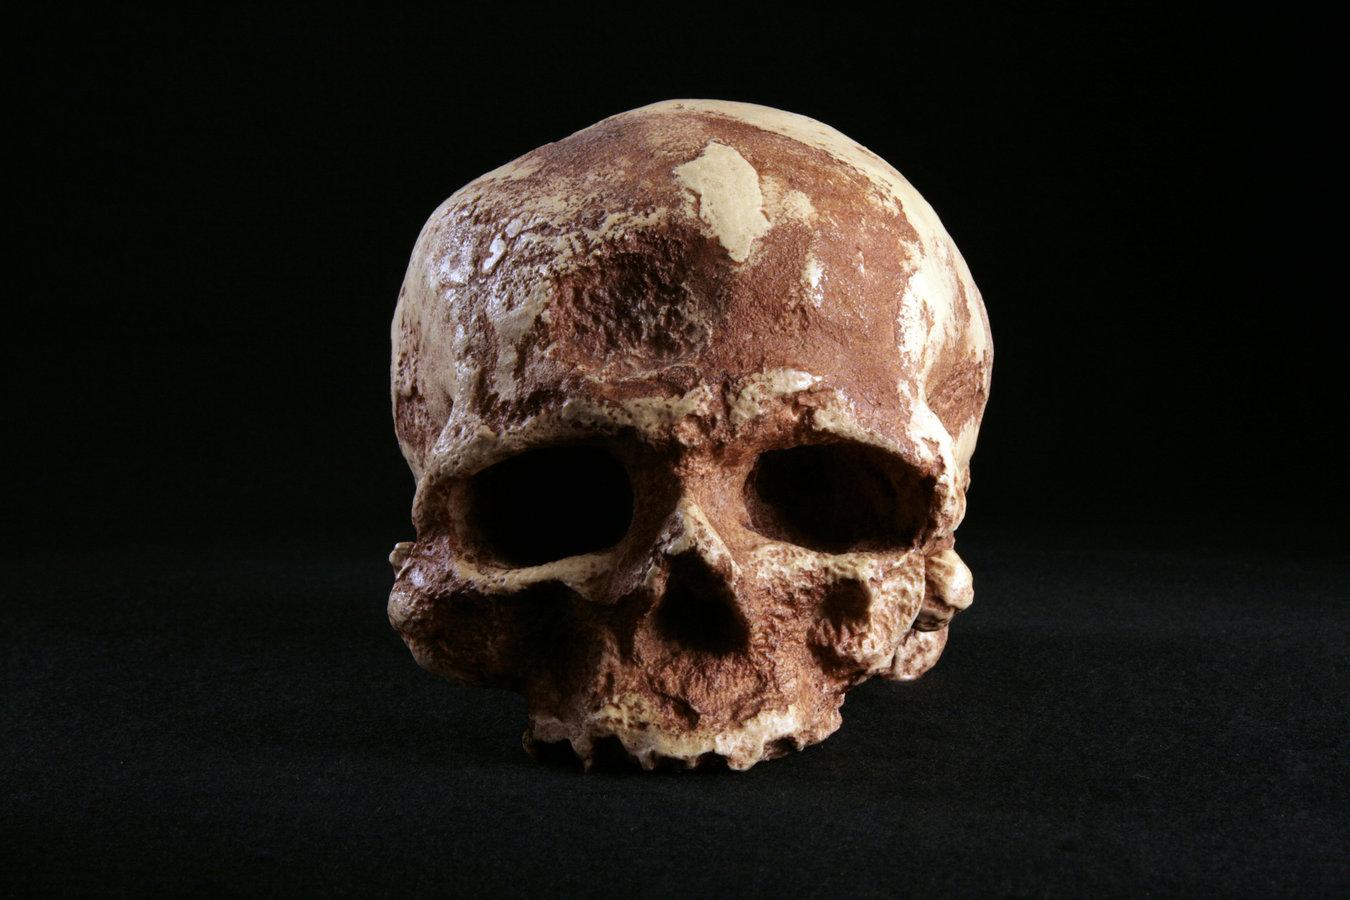 360° View Hominid Skull-Homo sapiens Cro-Magnon 1